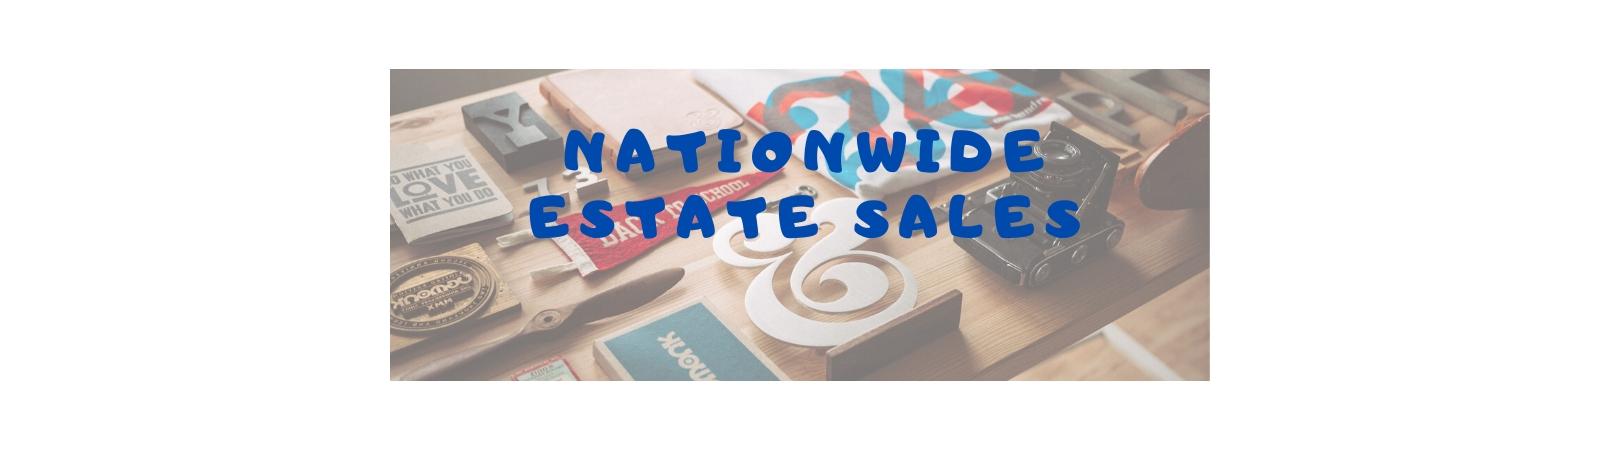 Nationwide Estate Sales Inc. | Auction Ninja